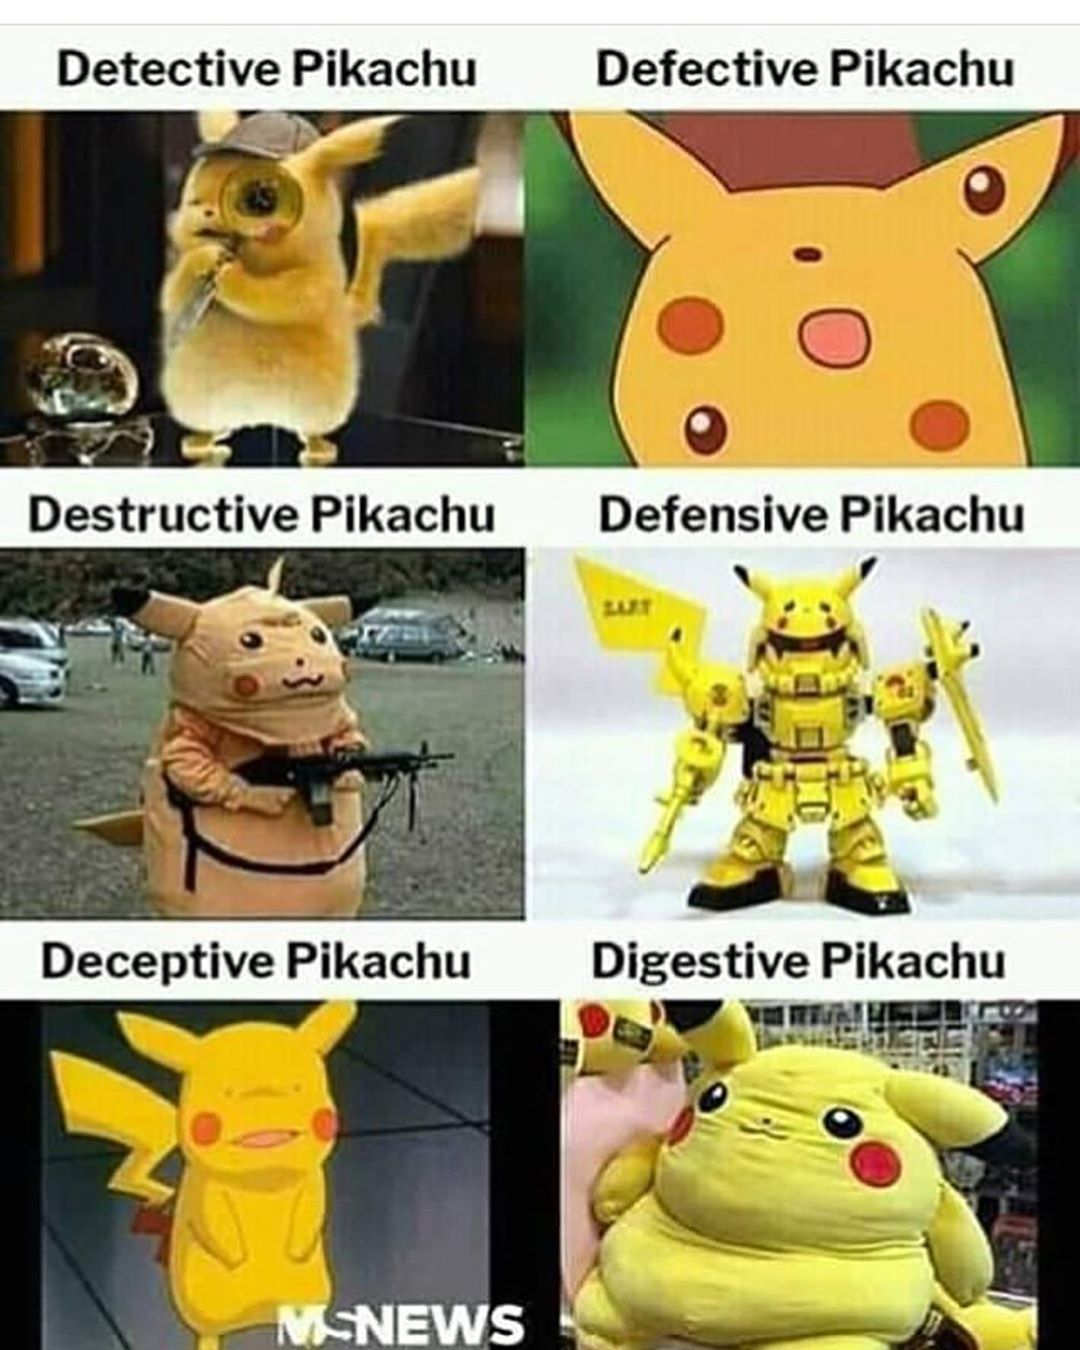 pikachus - meme